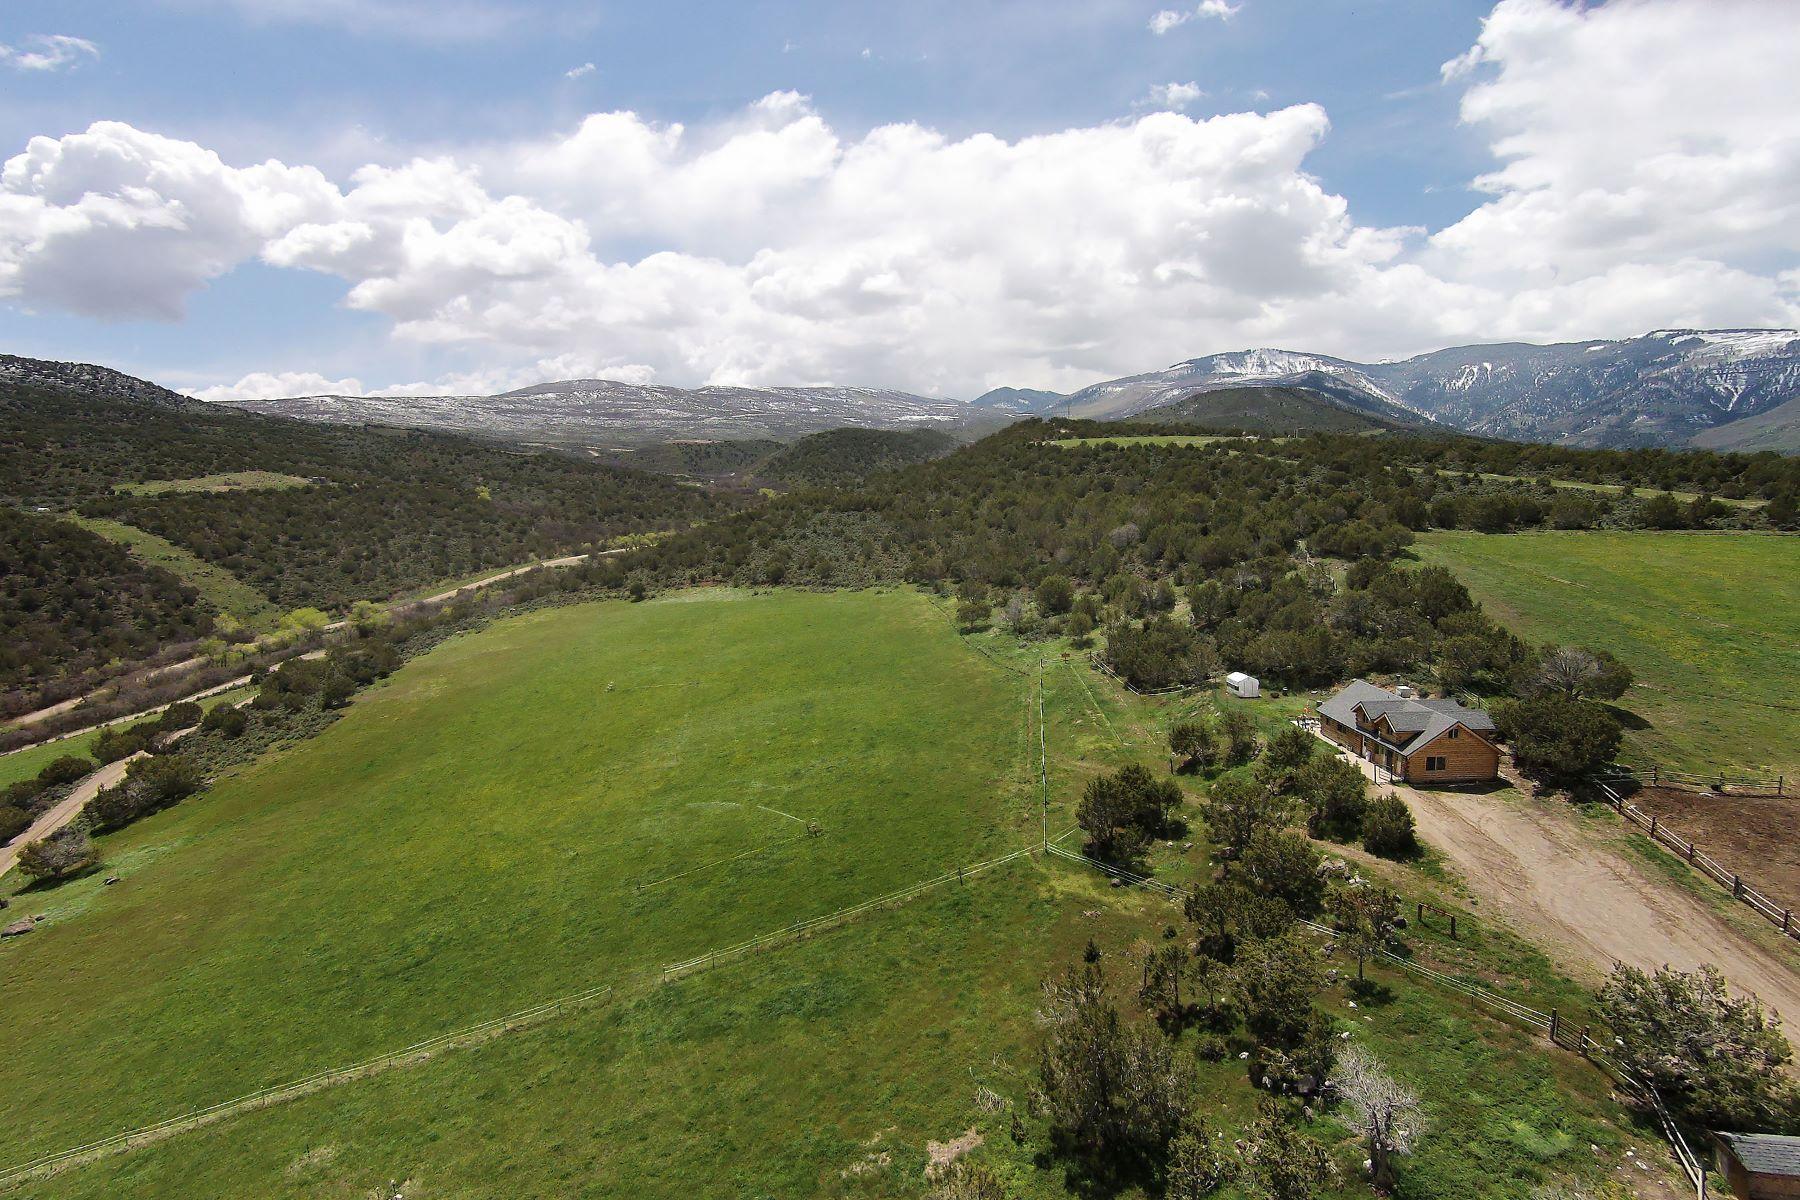 Fazenda / Rancho / Plantação para Venda às Lucky 13 Ranch 2309 County Road 317 Rifle, Colorado, 81650 Estados Unidos